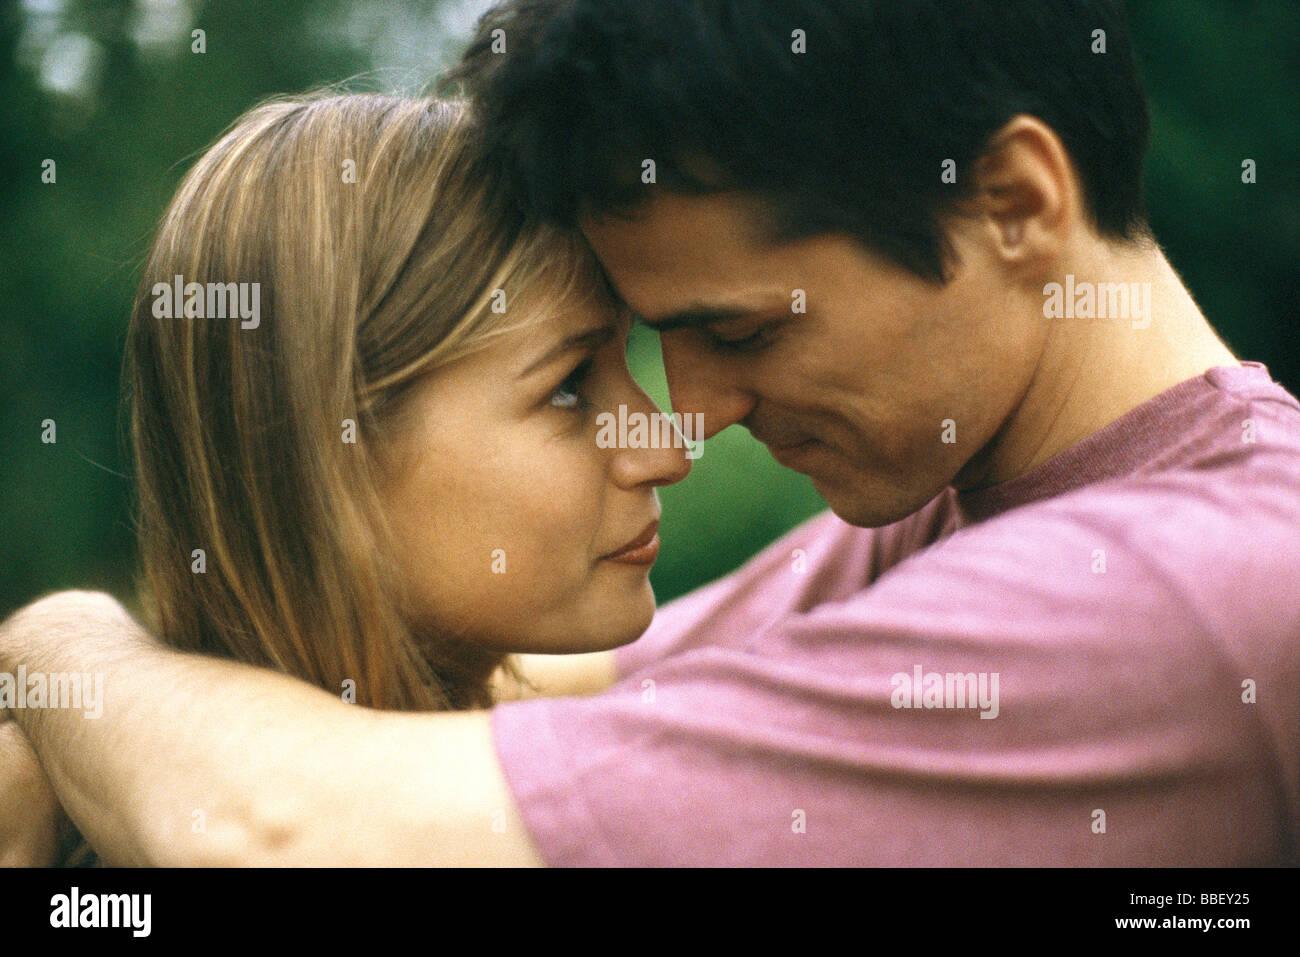 Couple, toucher leur front, side view Photo Stock